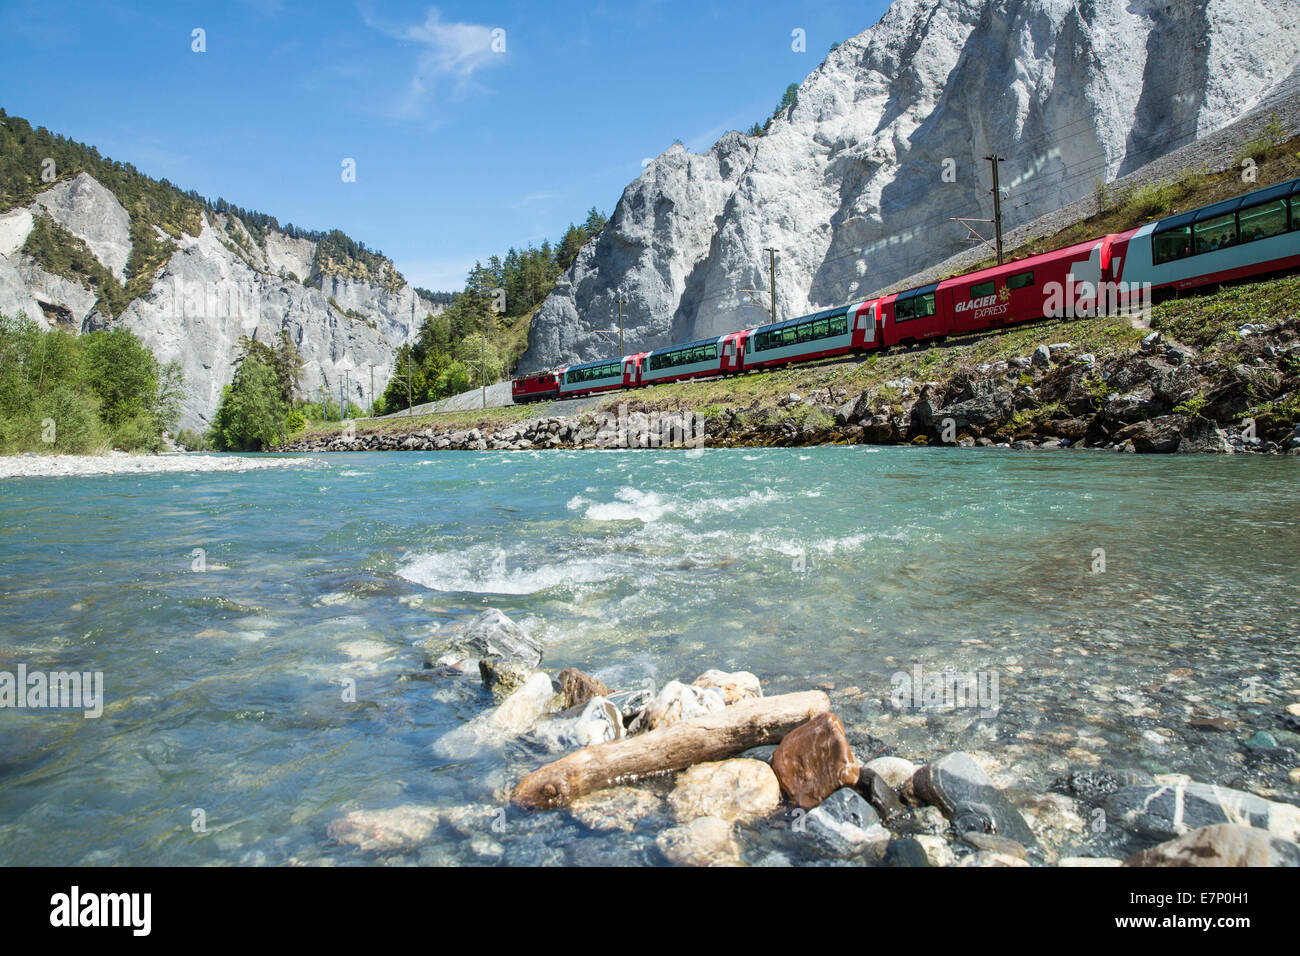 Surselva, Glacier express, Rhine gulch, Versam, GR, canton, Graubünden, Grisons, spring, river, flow, body - Stock Image